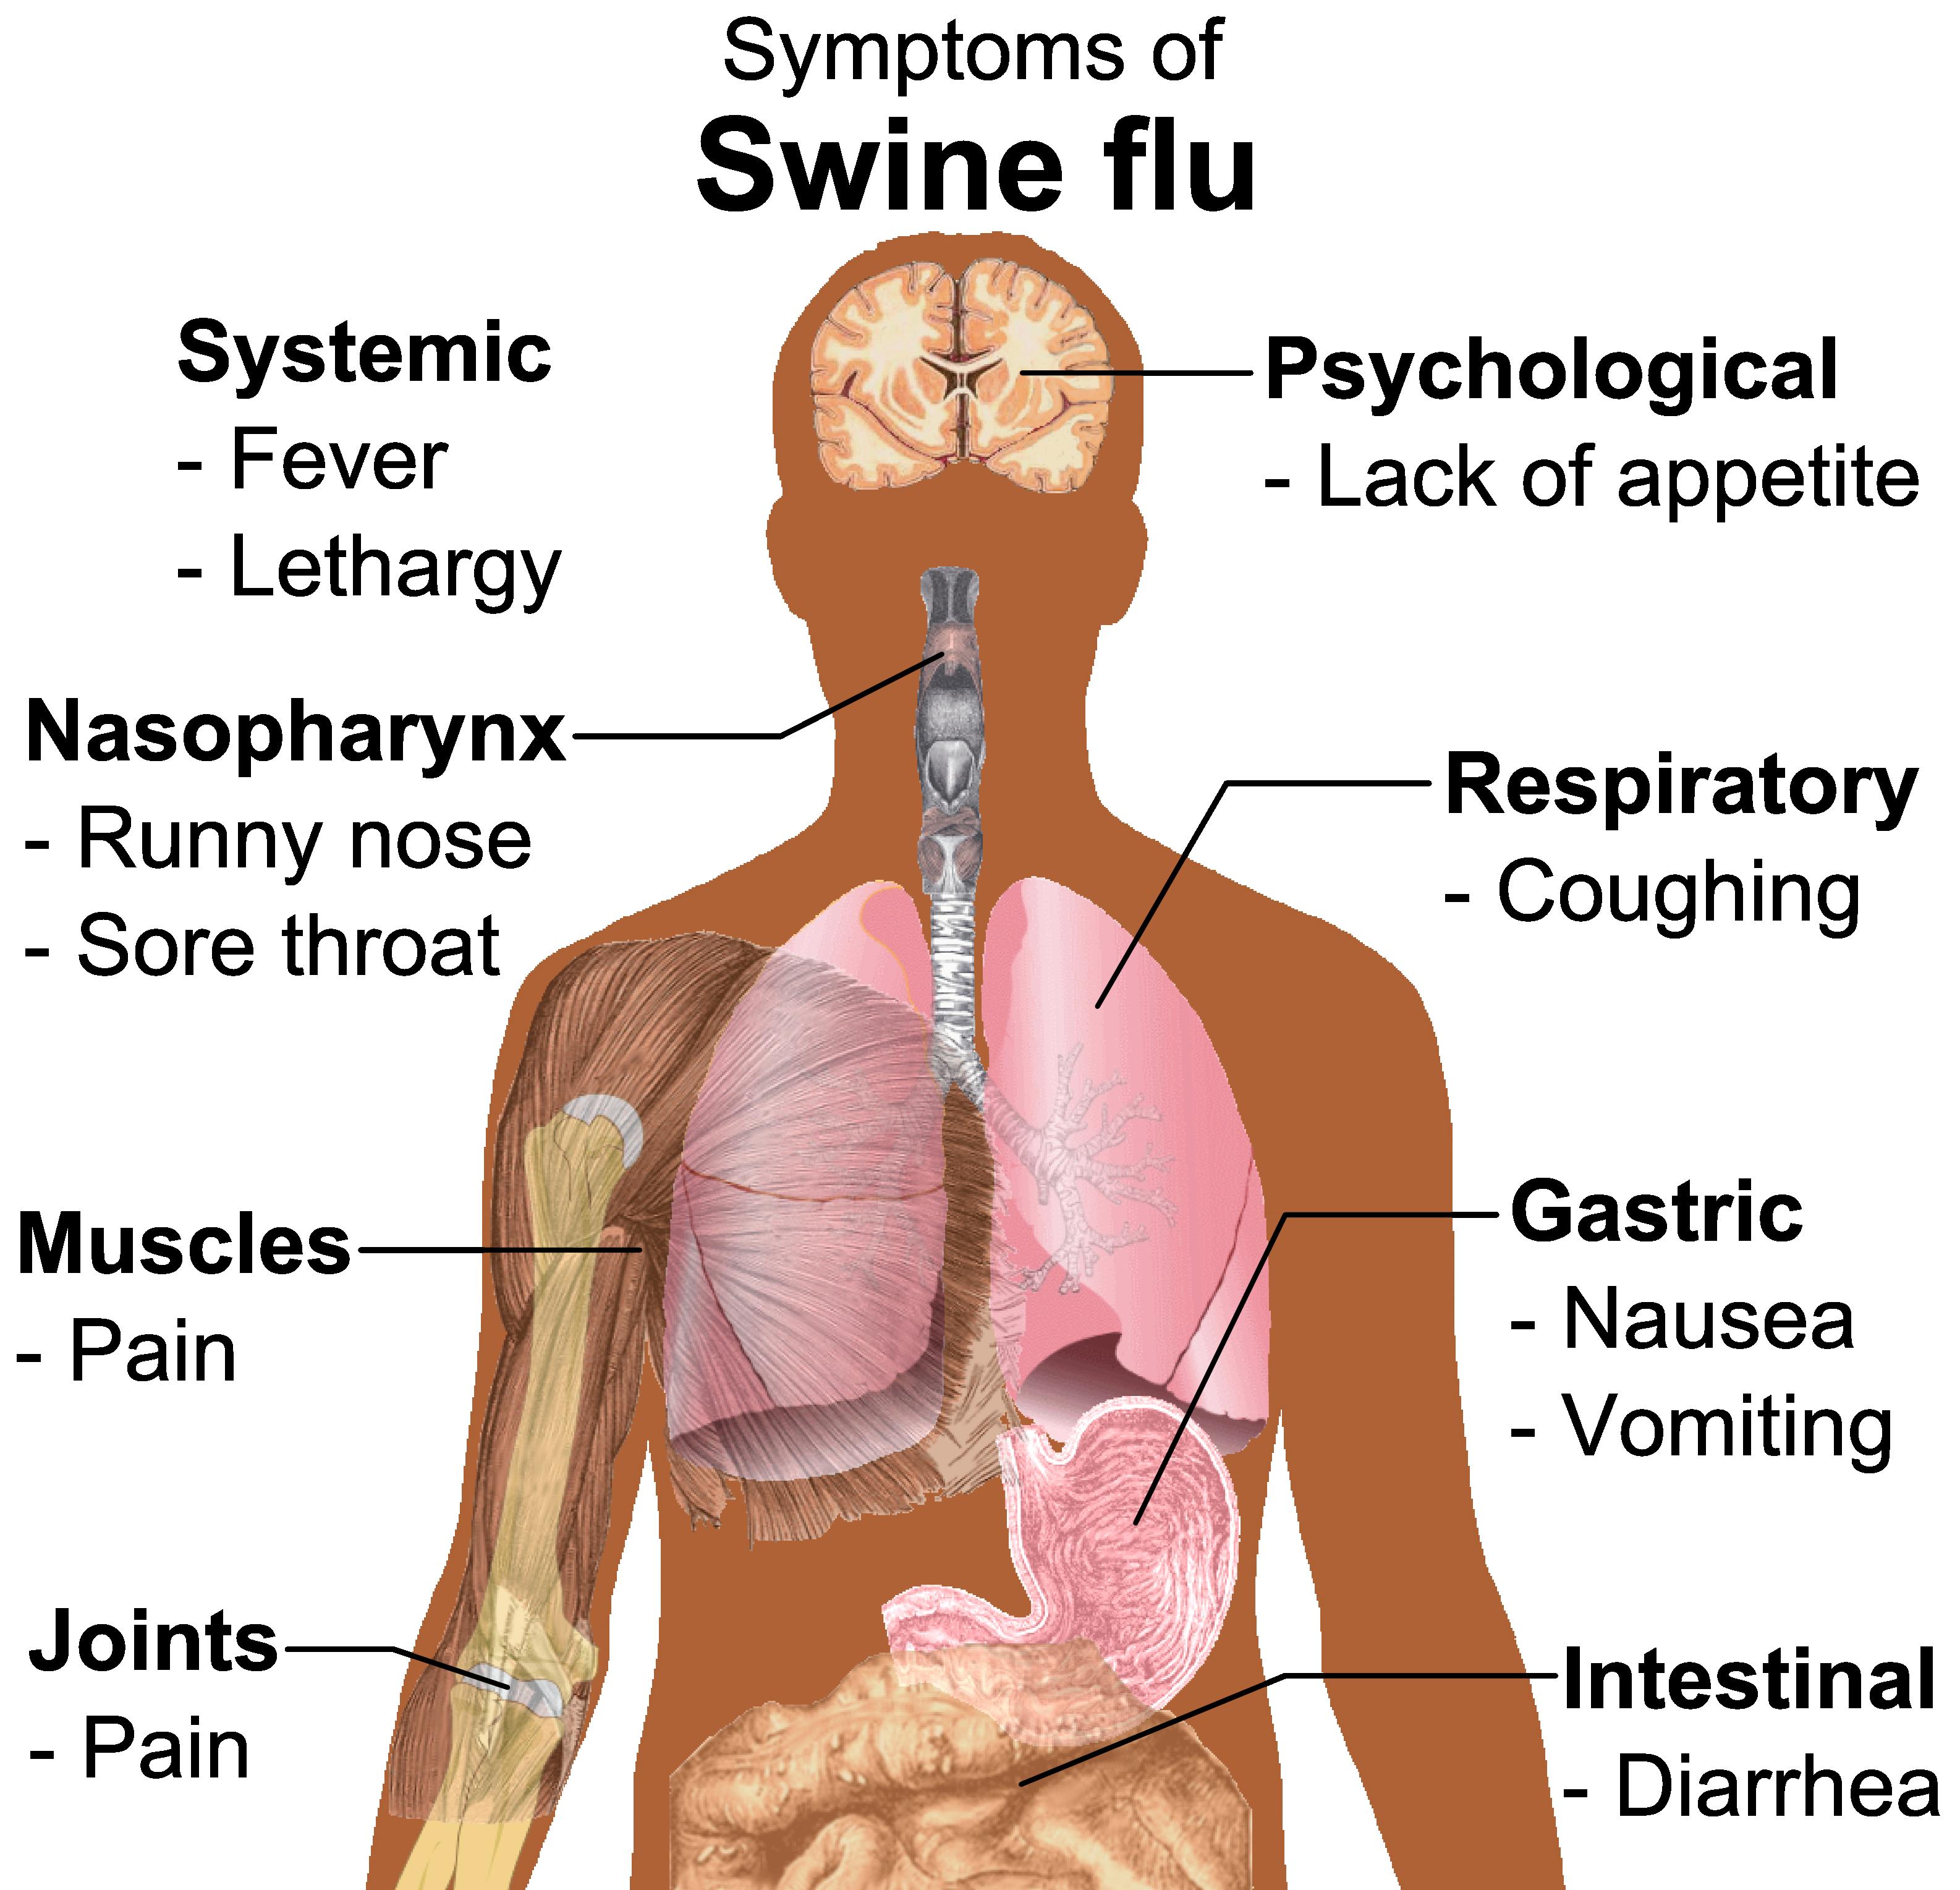 Symptoms_of_swine_flu.png